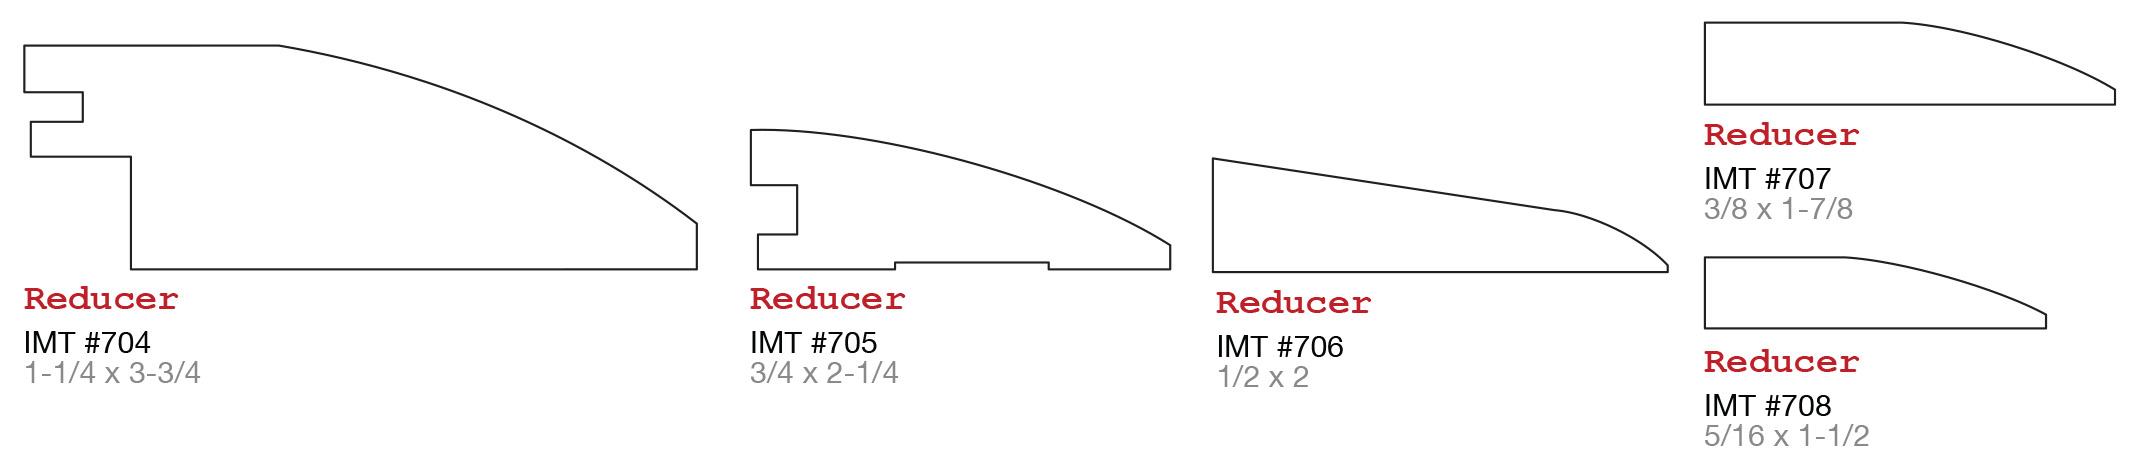 Evermark IMT millwork floor transitions